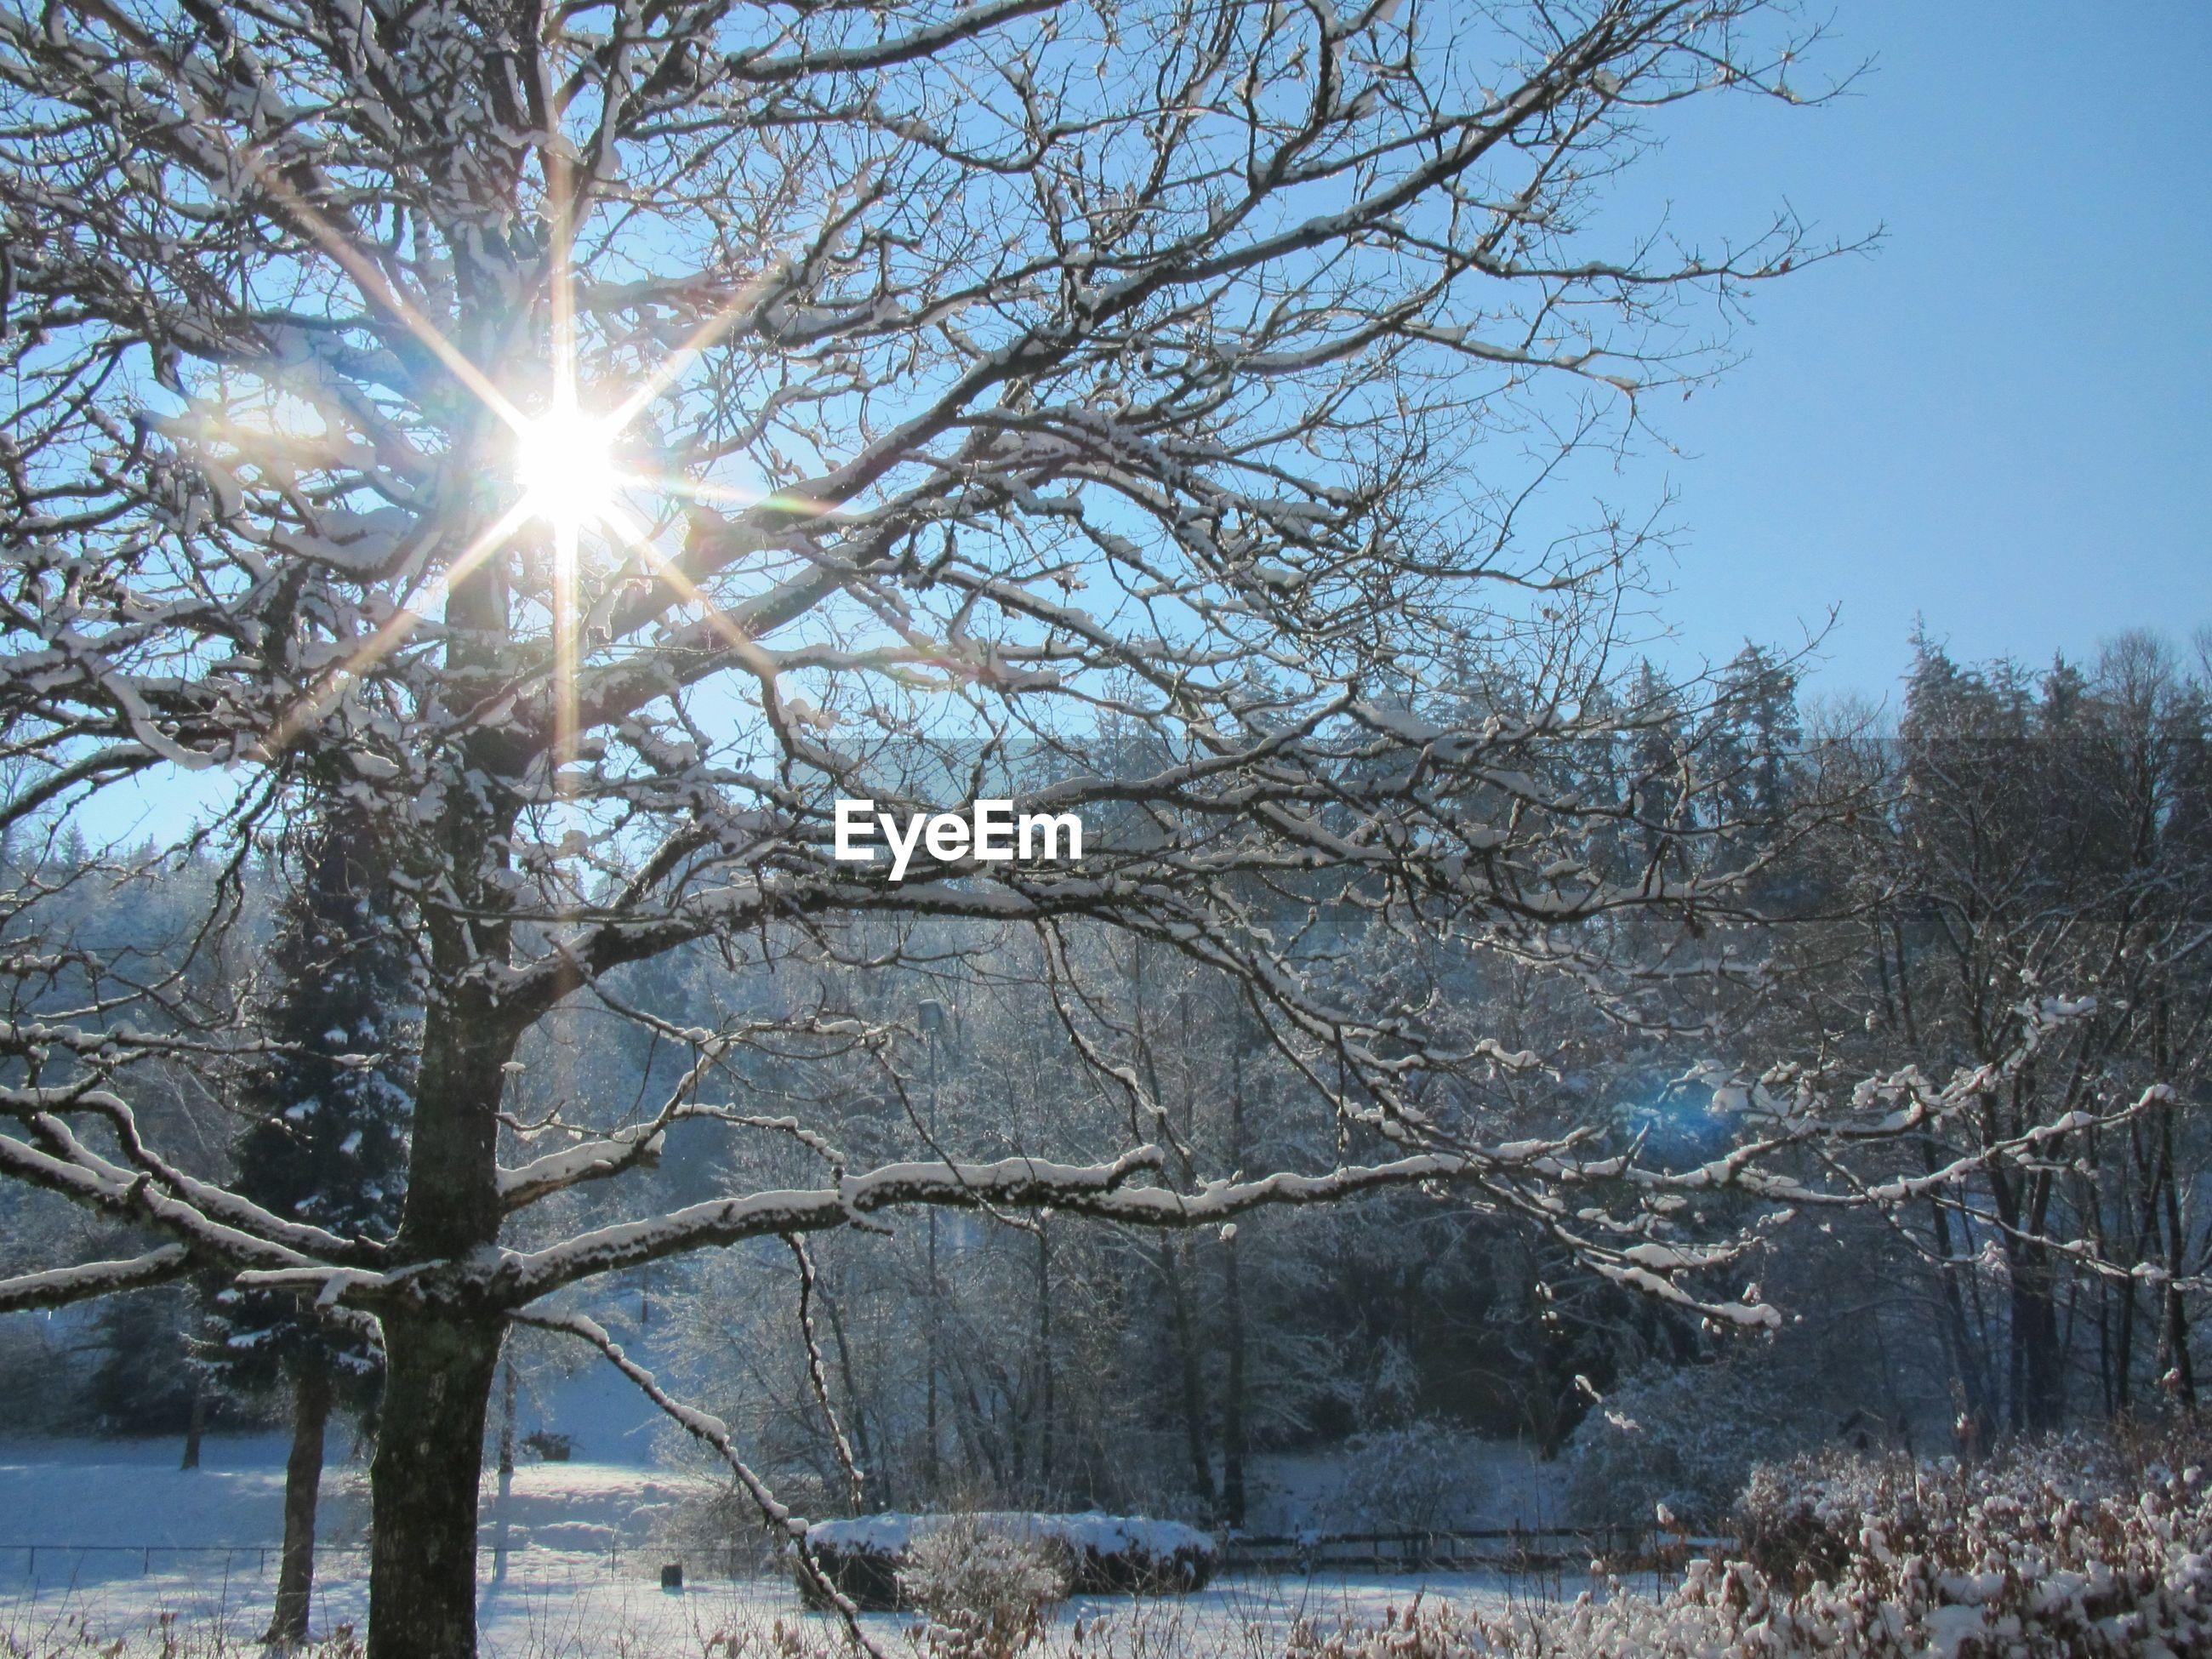 SUN SHINING THROUGH BARE TREE DURING WINTER